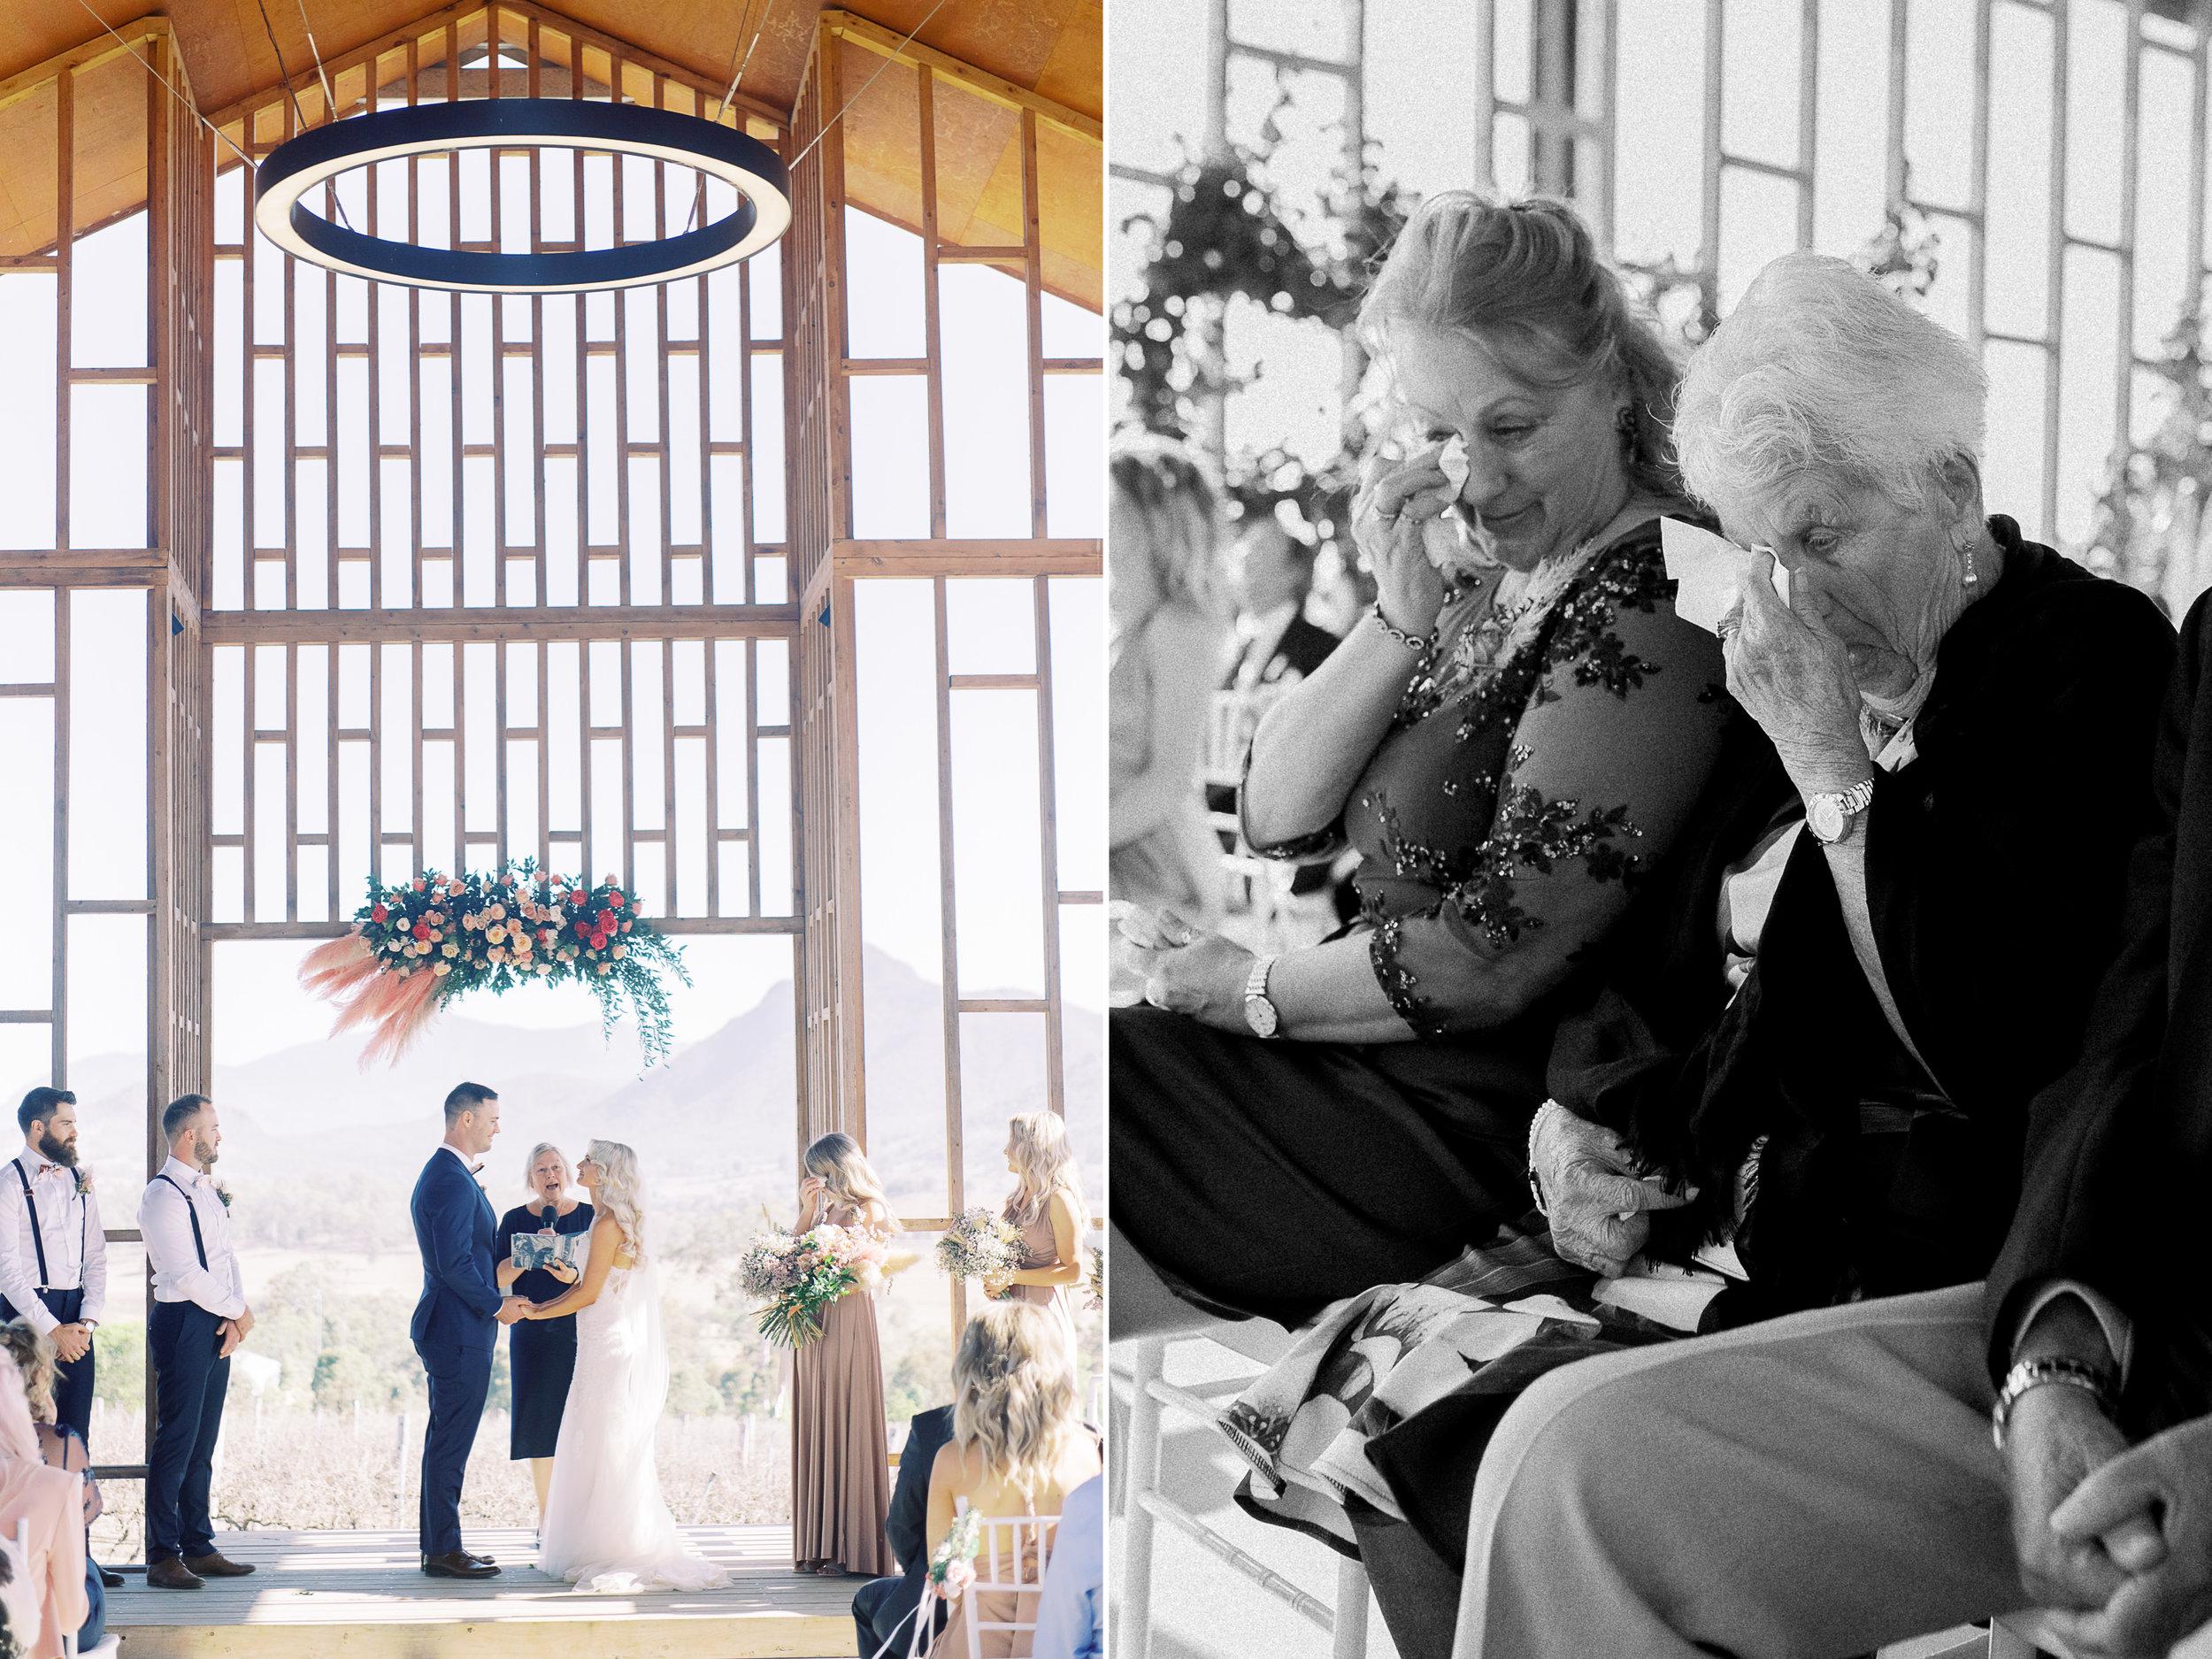 kooroomba-lavendar-farm-film-photography-wedding-photography-romantic-13.jpg